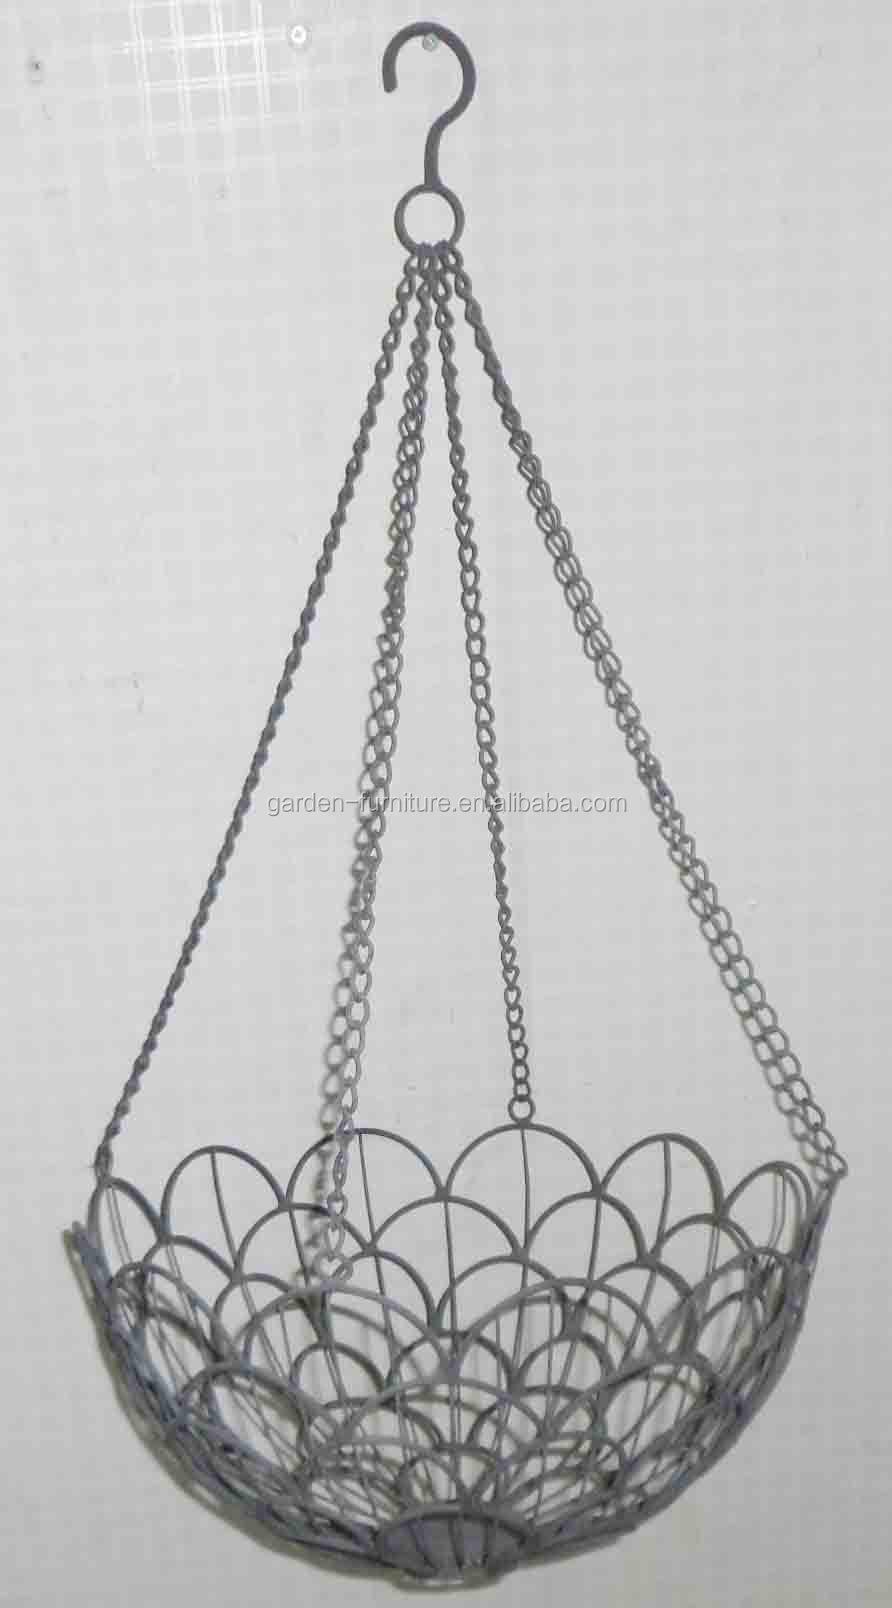 Wholesale Garden Accessory Decorative Metal Hanging Basket